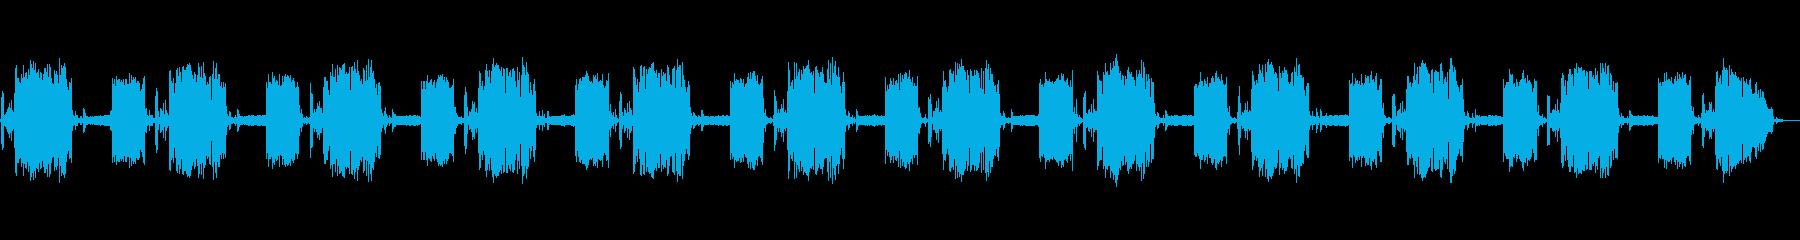 DOT MATRIX PRINTE...の再生済みの波形